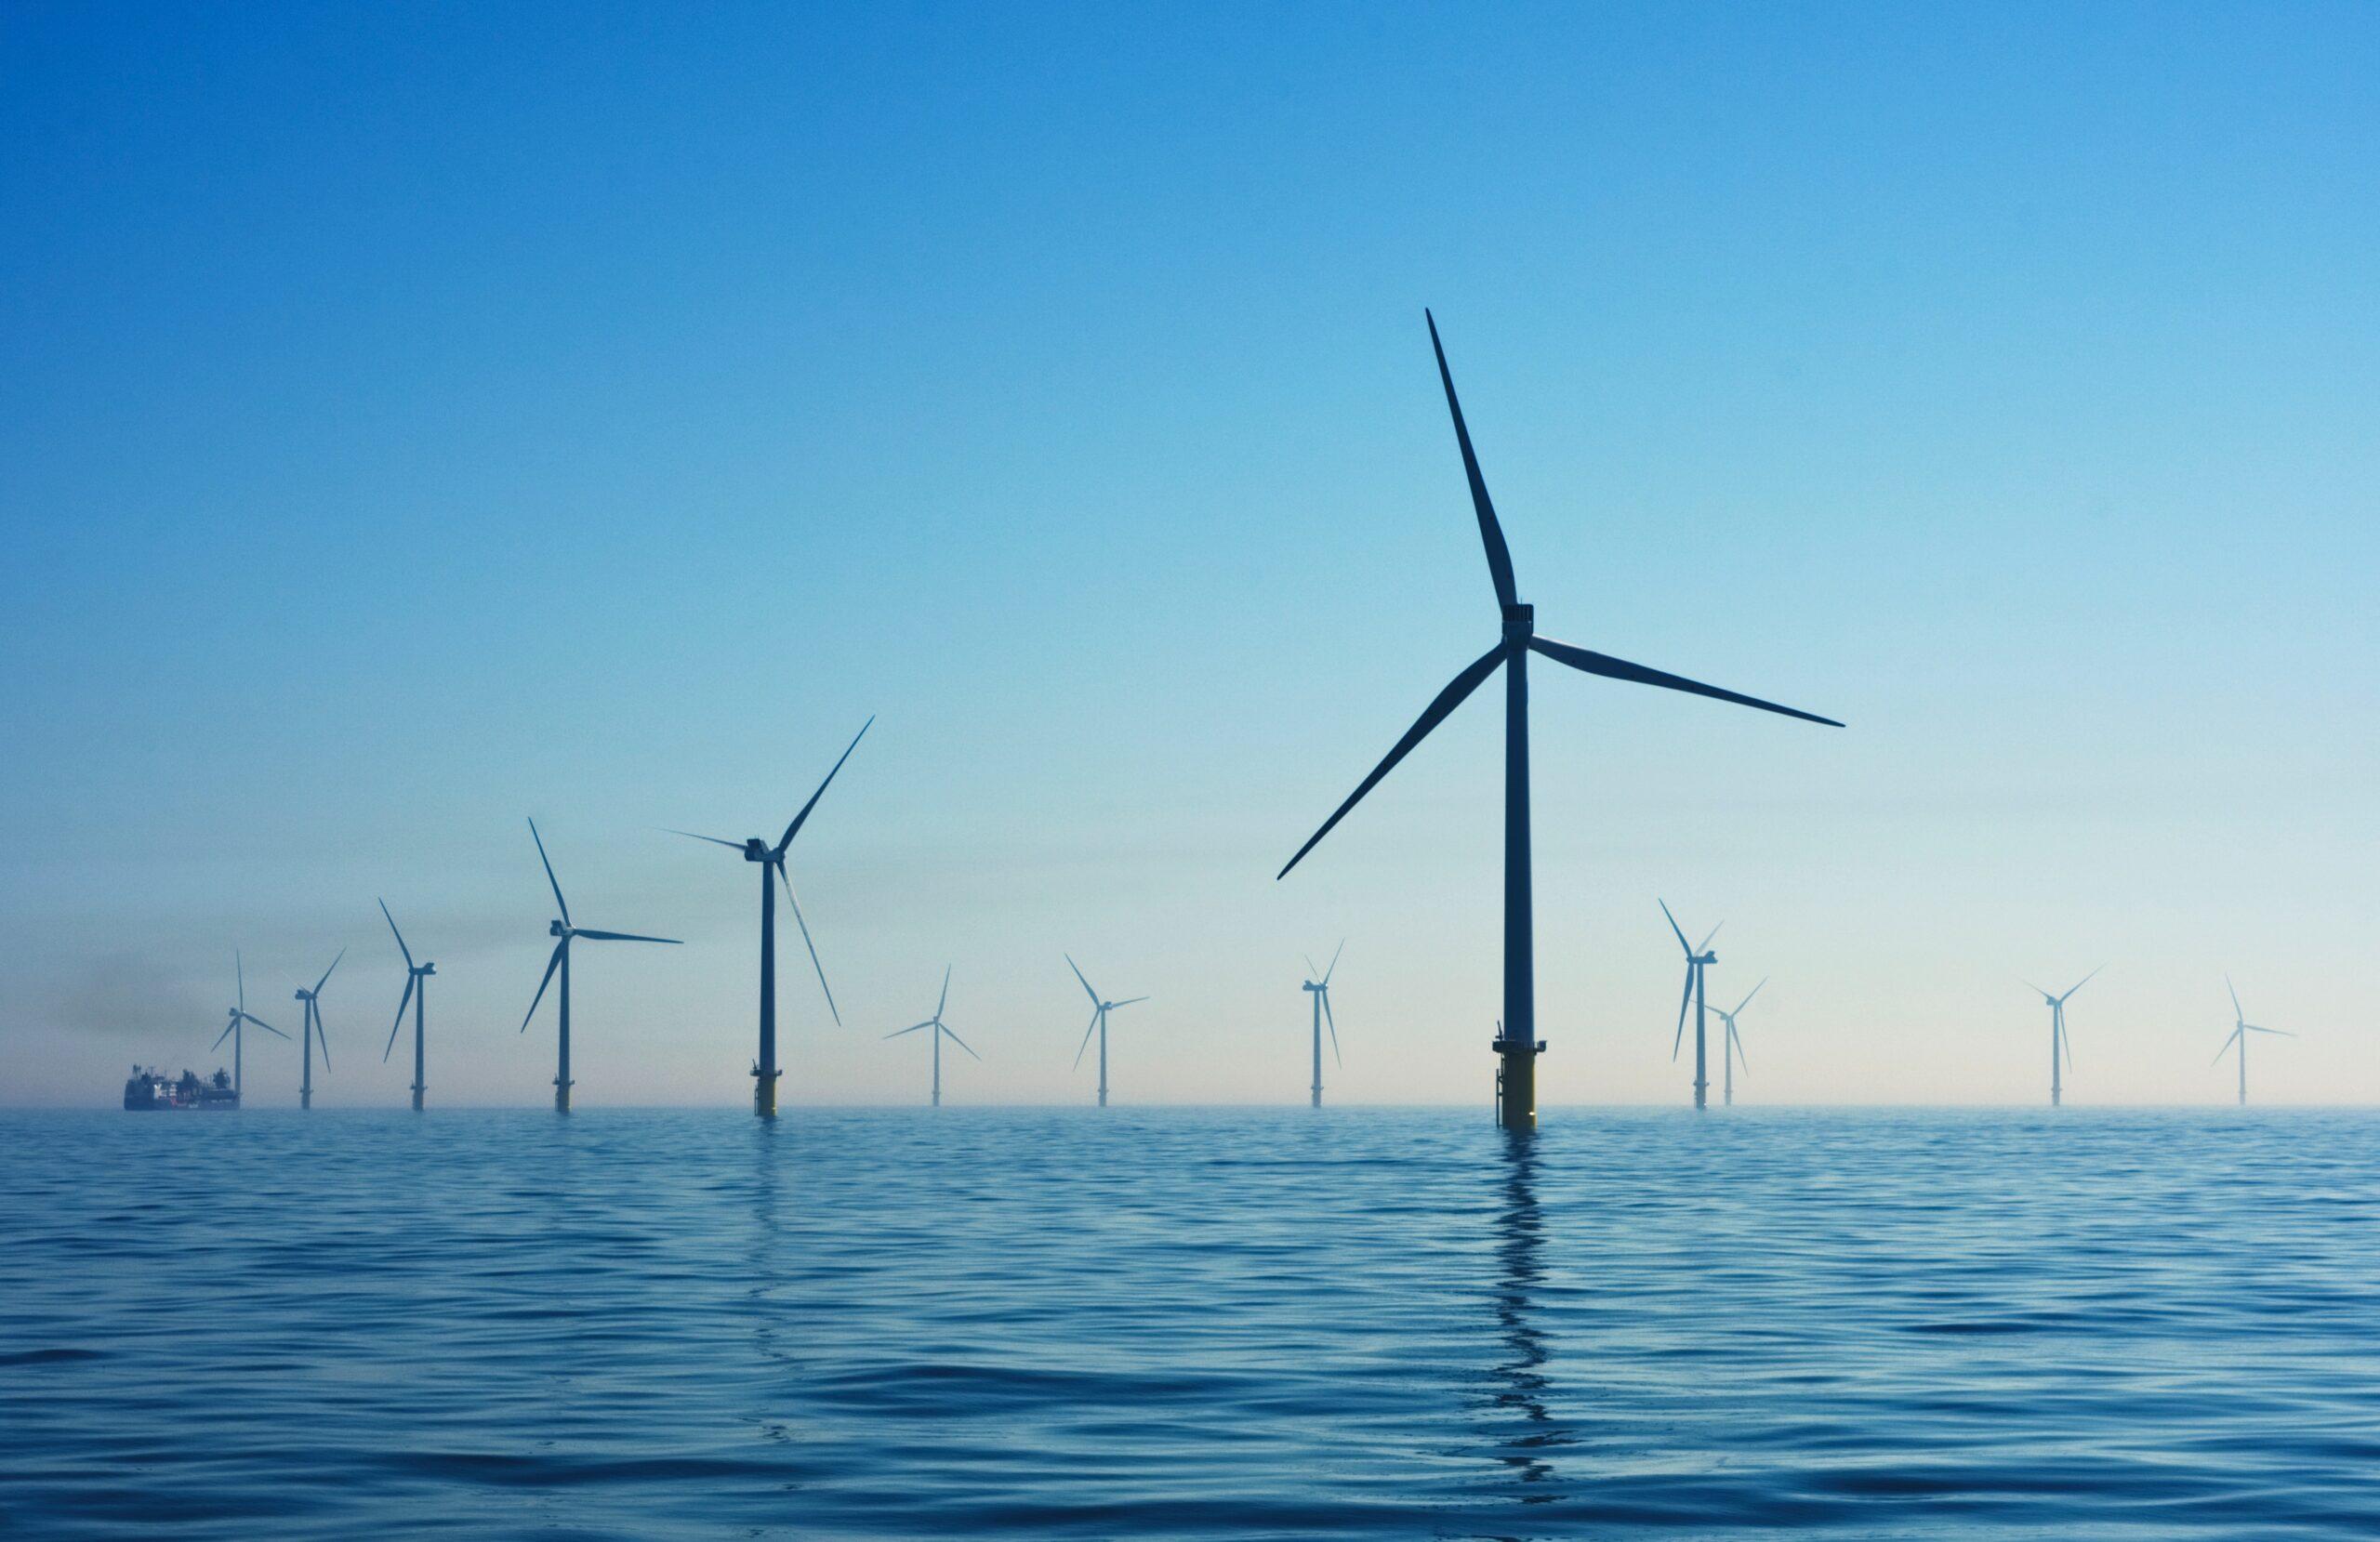 Radical New Power Plant Set to Revolutionize East Coast Power Grid